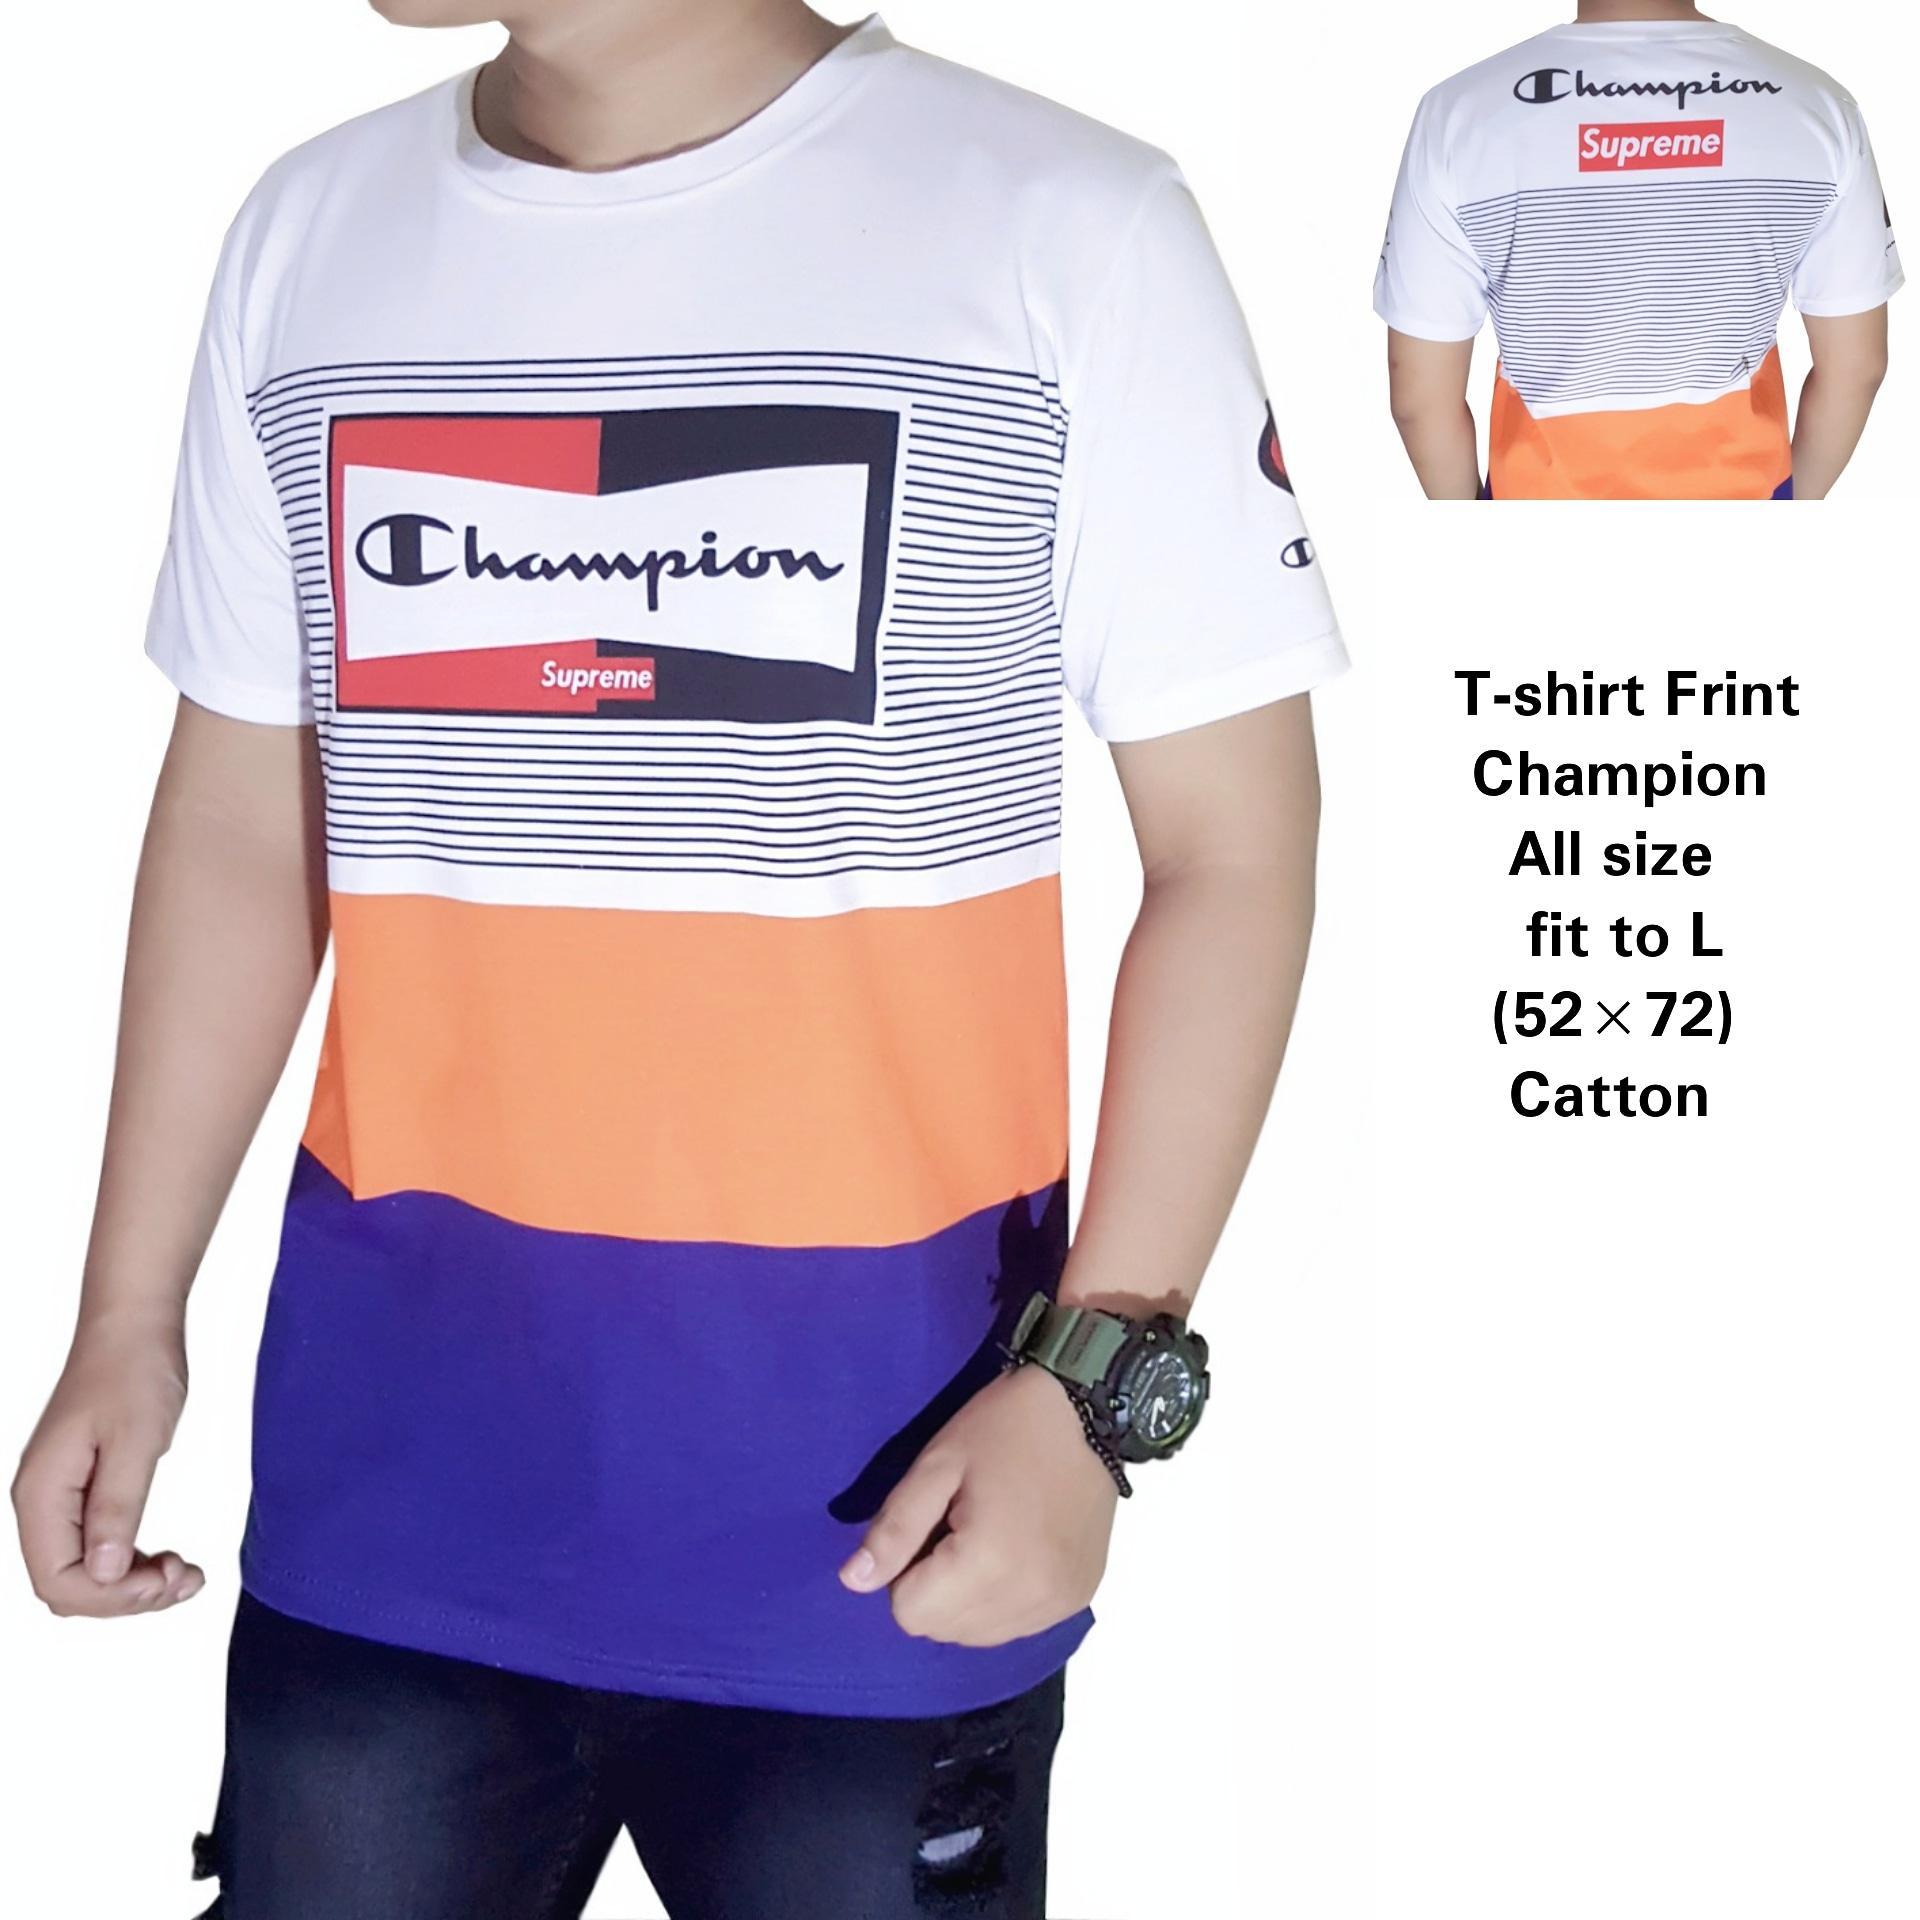 Anugrah – kaos distro T-shirt Fashion 100% soft cotton combed 30s premium pria wanita cewe cowo baju T-shirt terbaru kekinian - atasan pakaian kaos oblong o ...